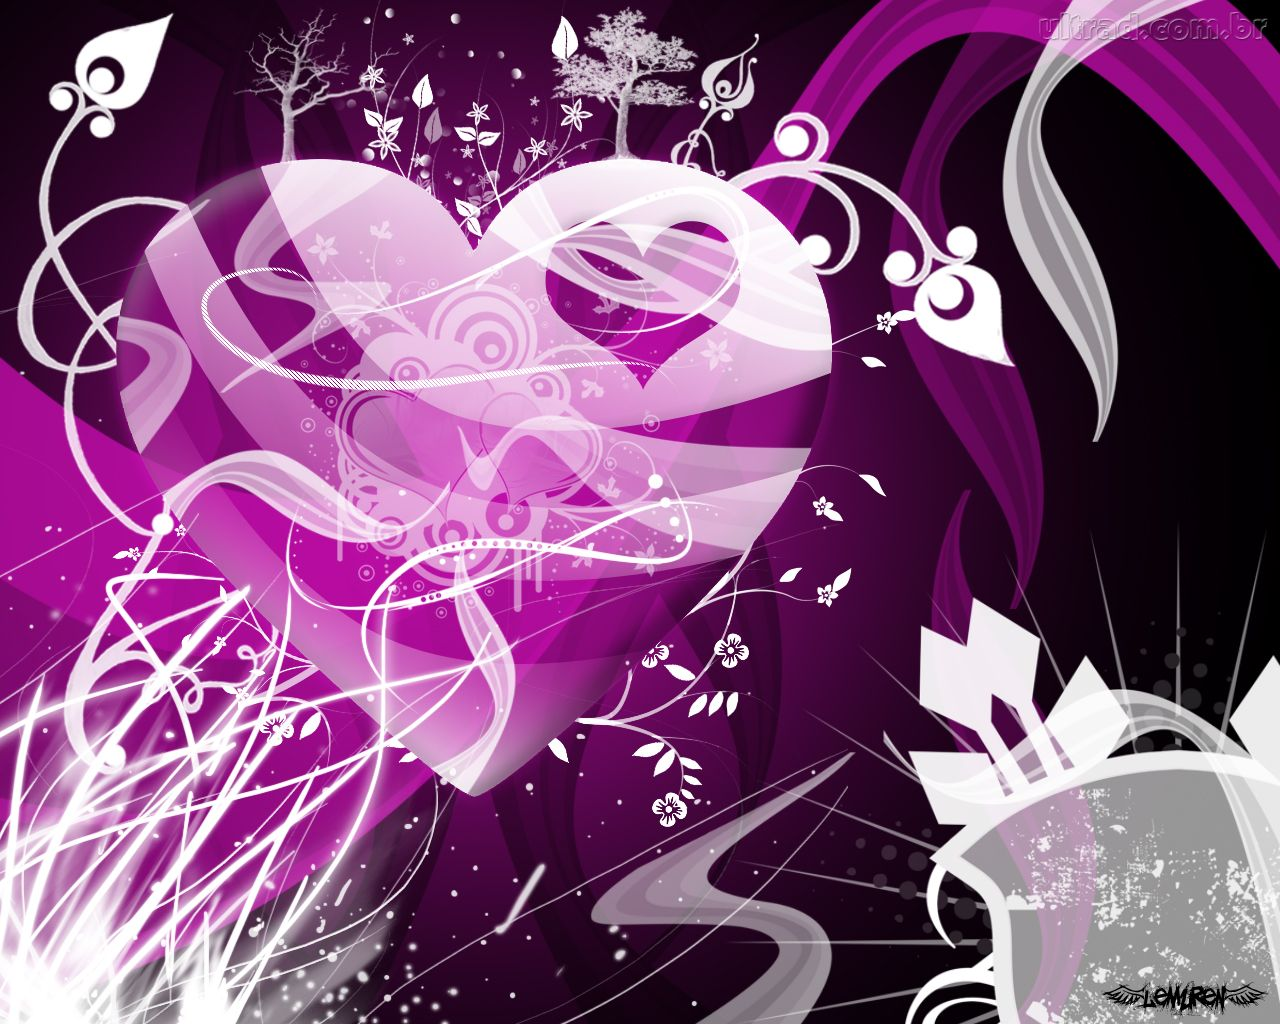 Purple Love Wallpaper: CONFISSÕES Á VIDA...: OS MAIS LINDOS PAPÉIS DE PAREDE